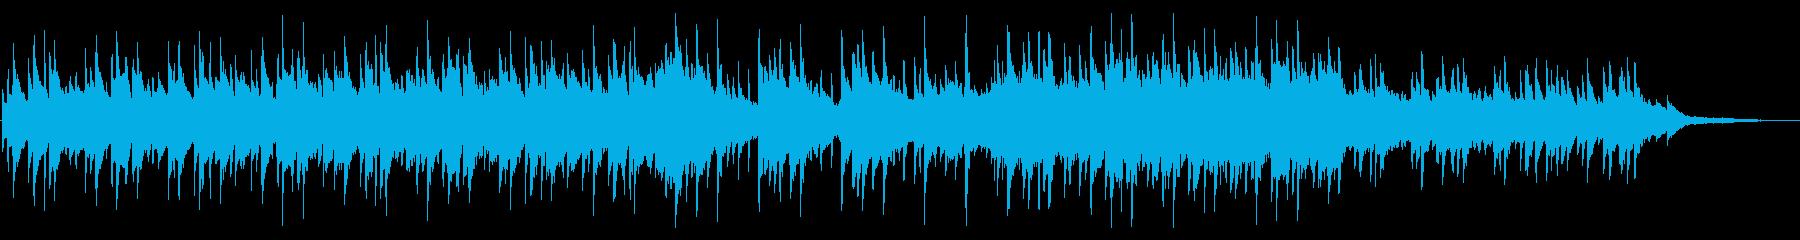 JapaneseStyle2の再生済みの波形